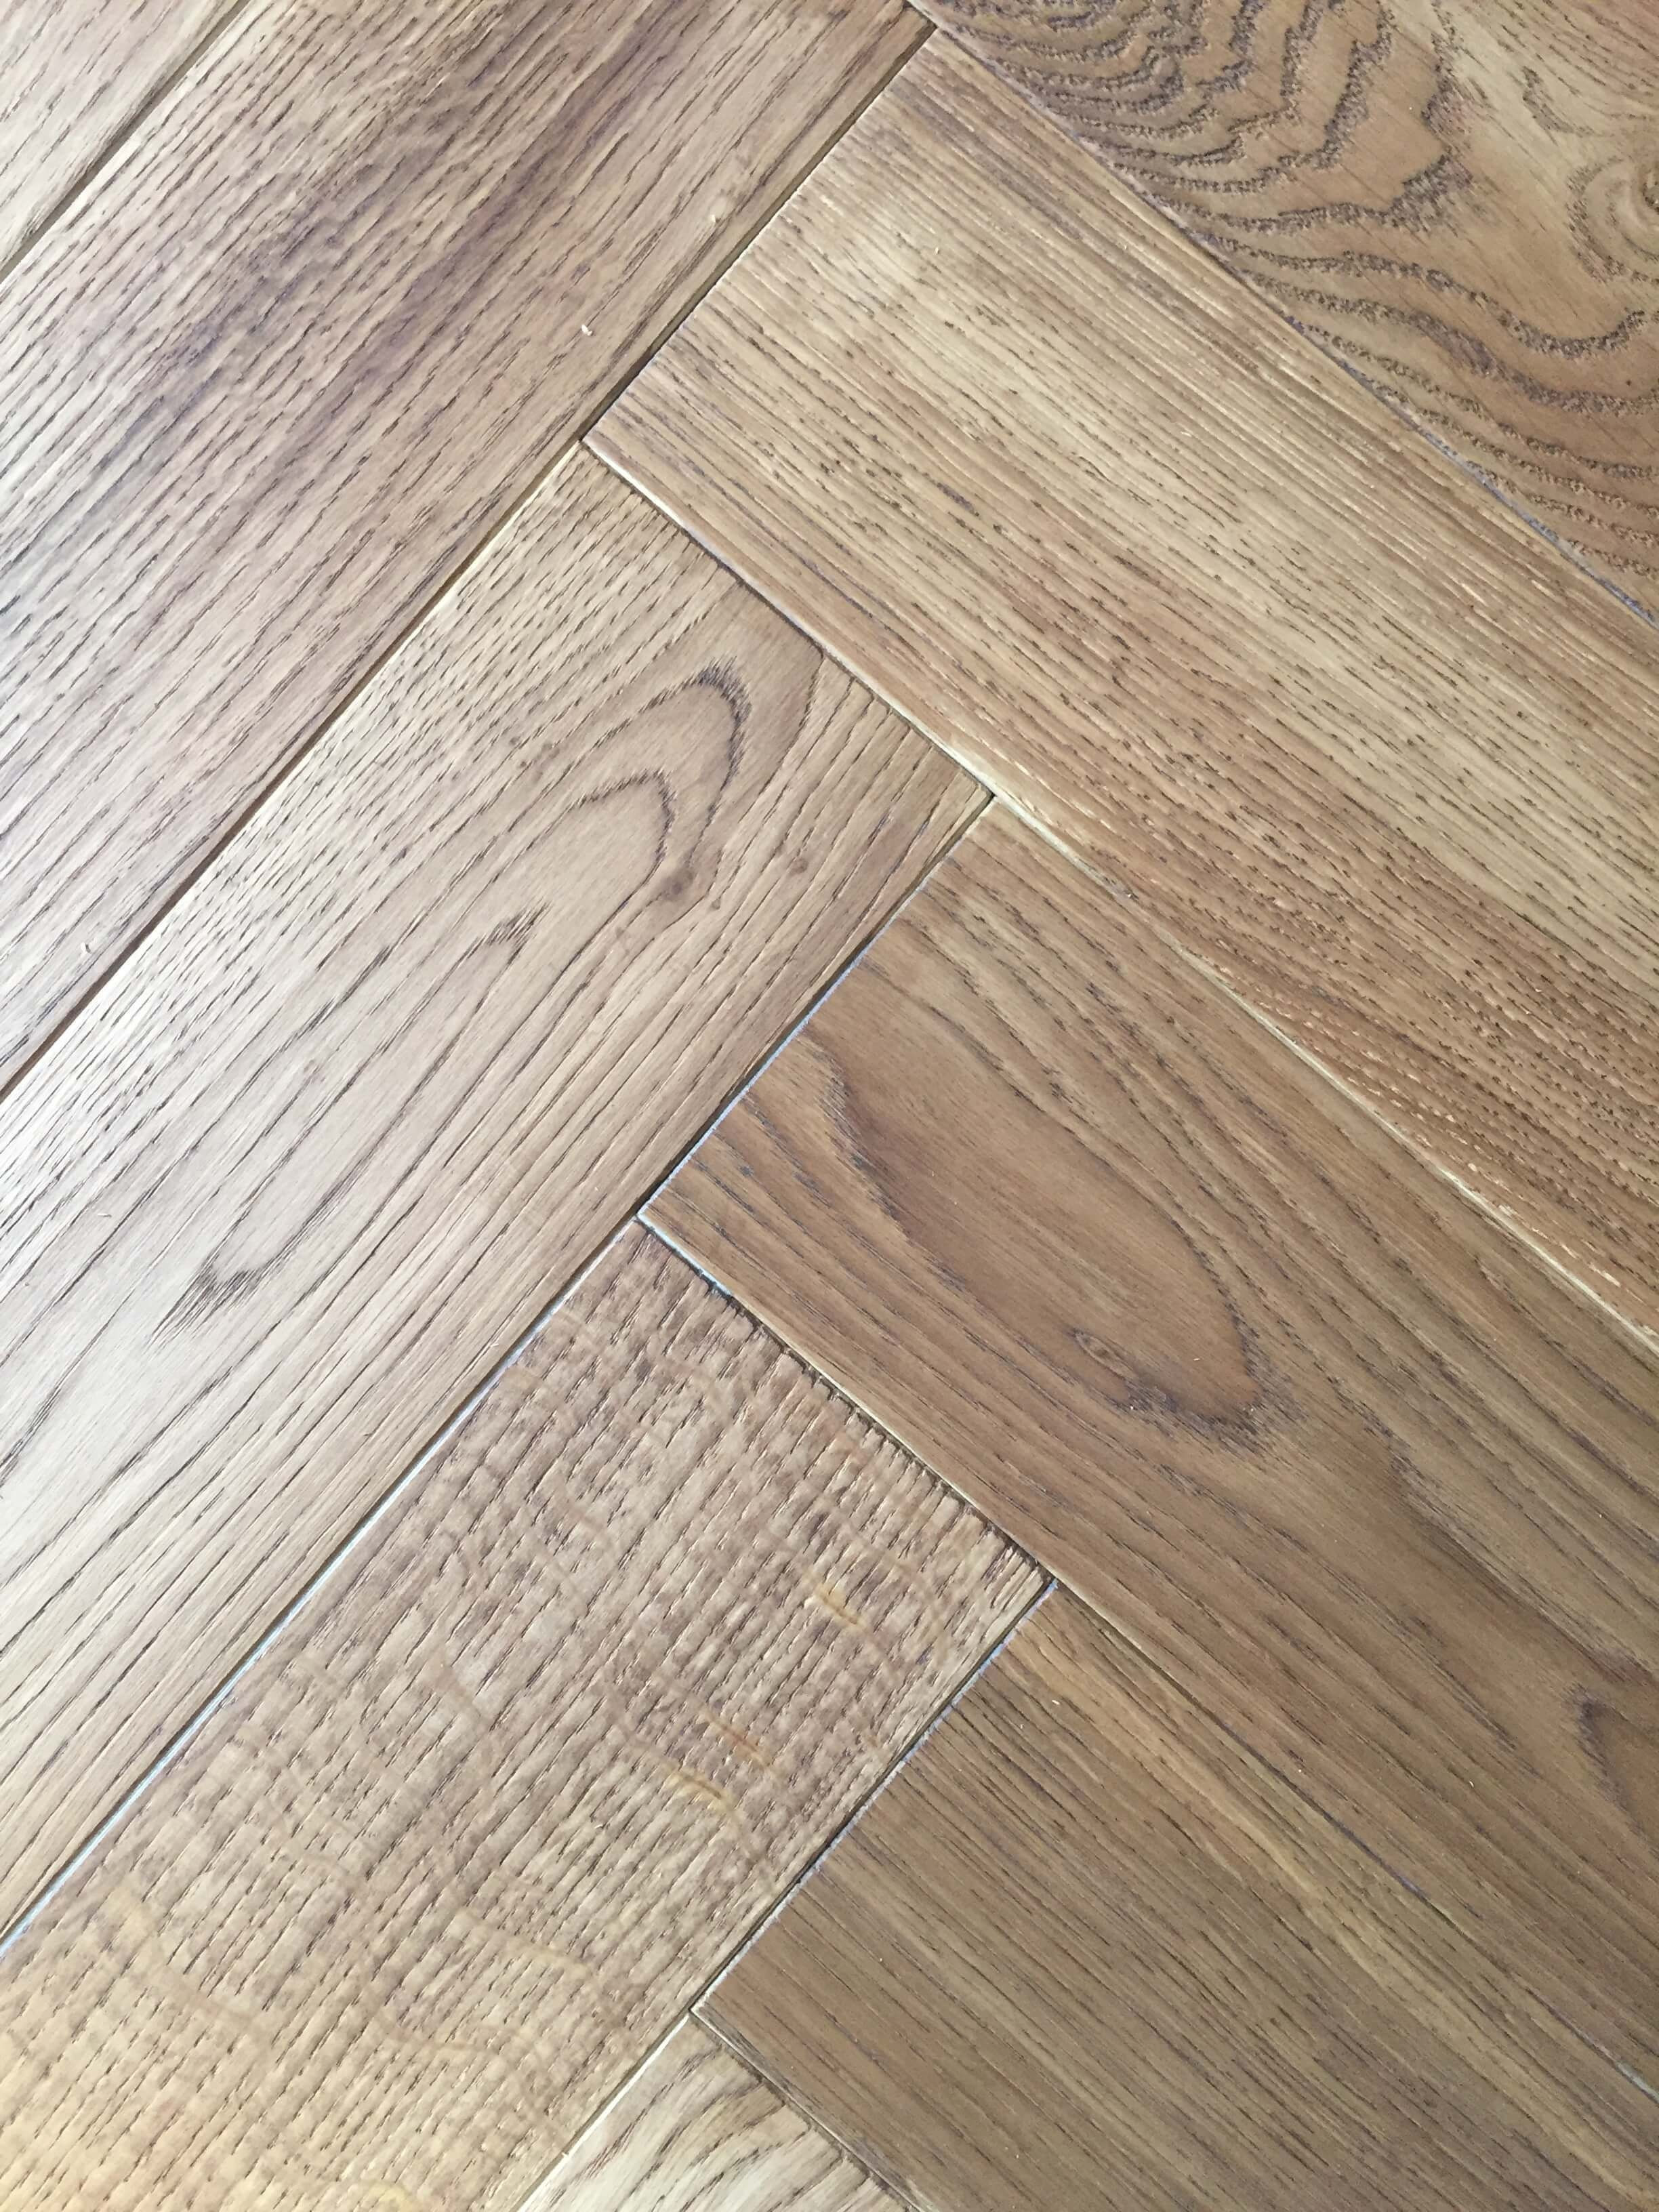 3 engineered hardwood flooring of handscraped engineered hardwood awesome engineered wood flooring regarding handscraped engineered hardwood awesome engineered wood flooring brown maple hand scraped engineered images